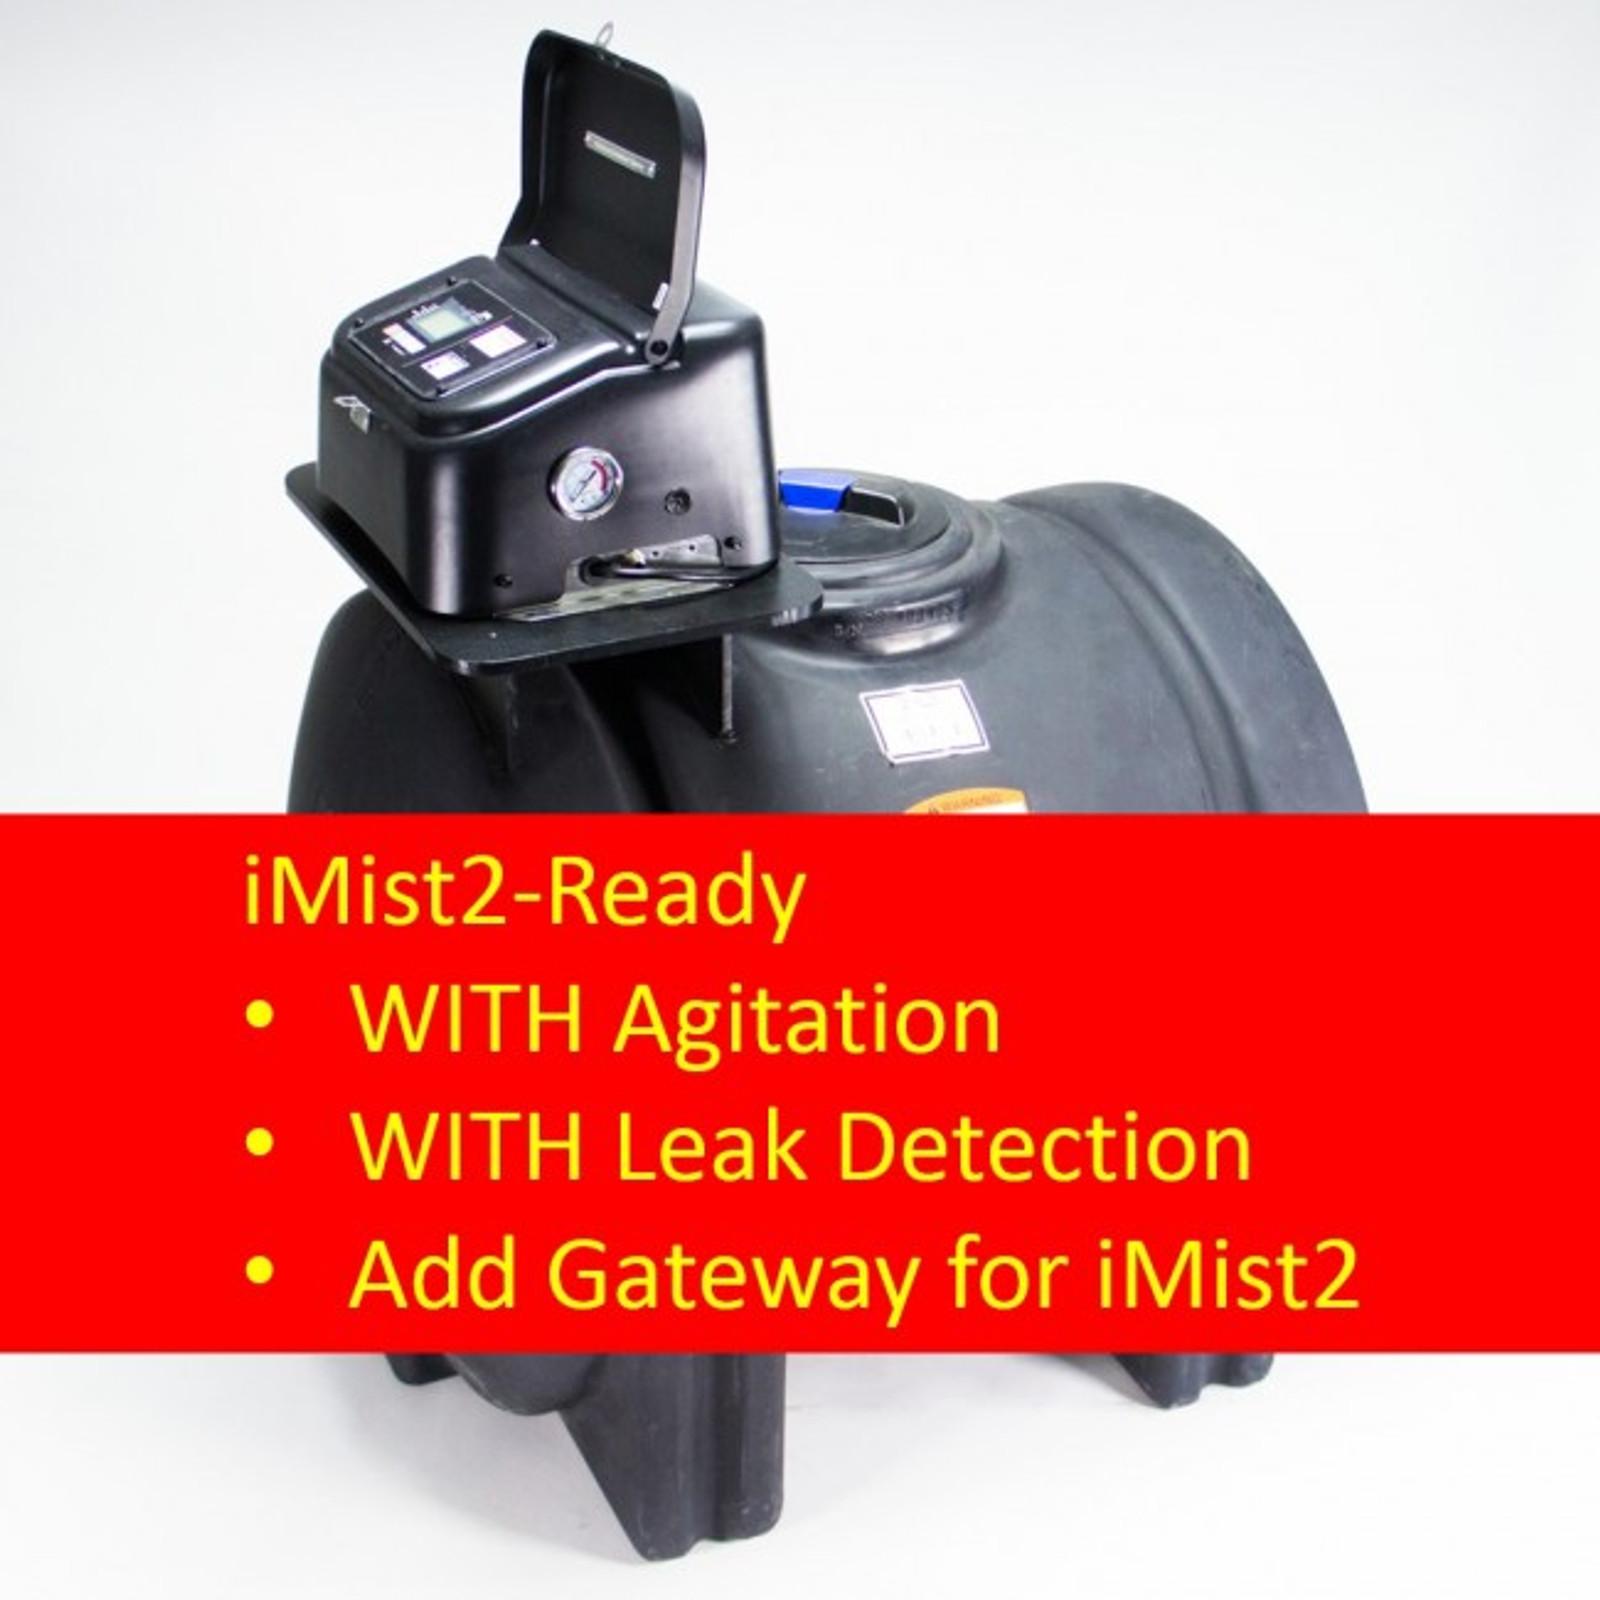 Gen 1.3 125 Gal w/ Agitation & Leak Detection